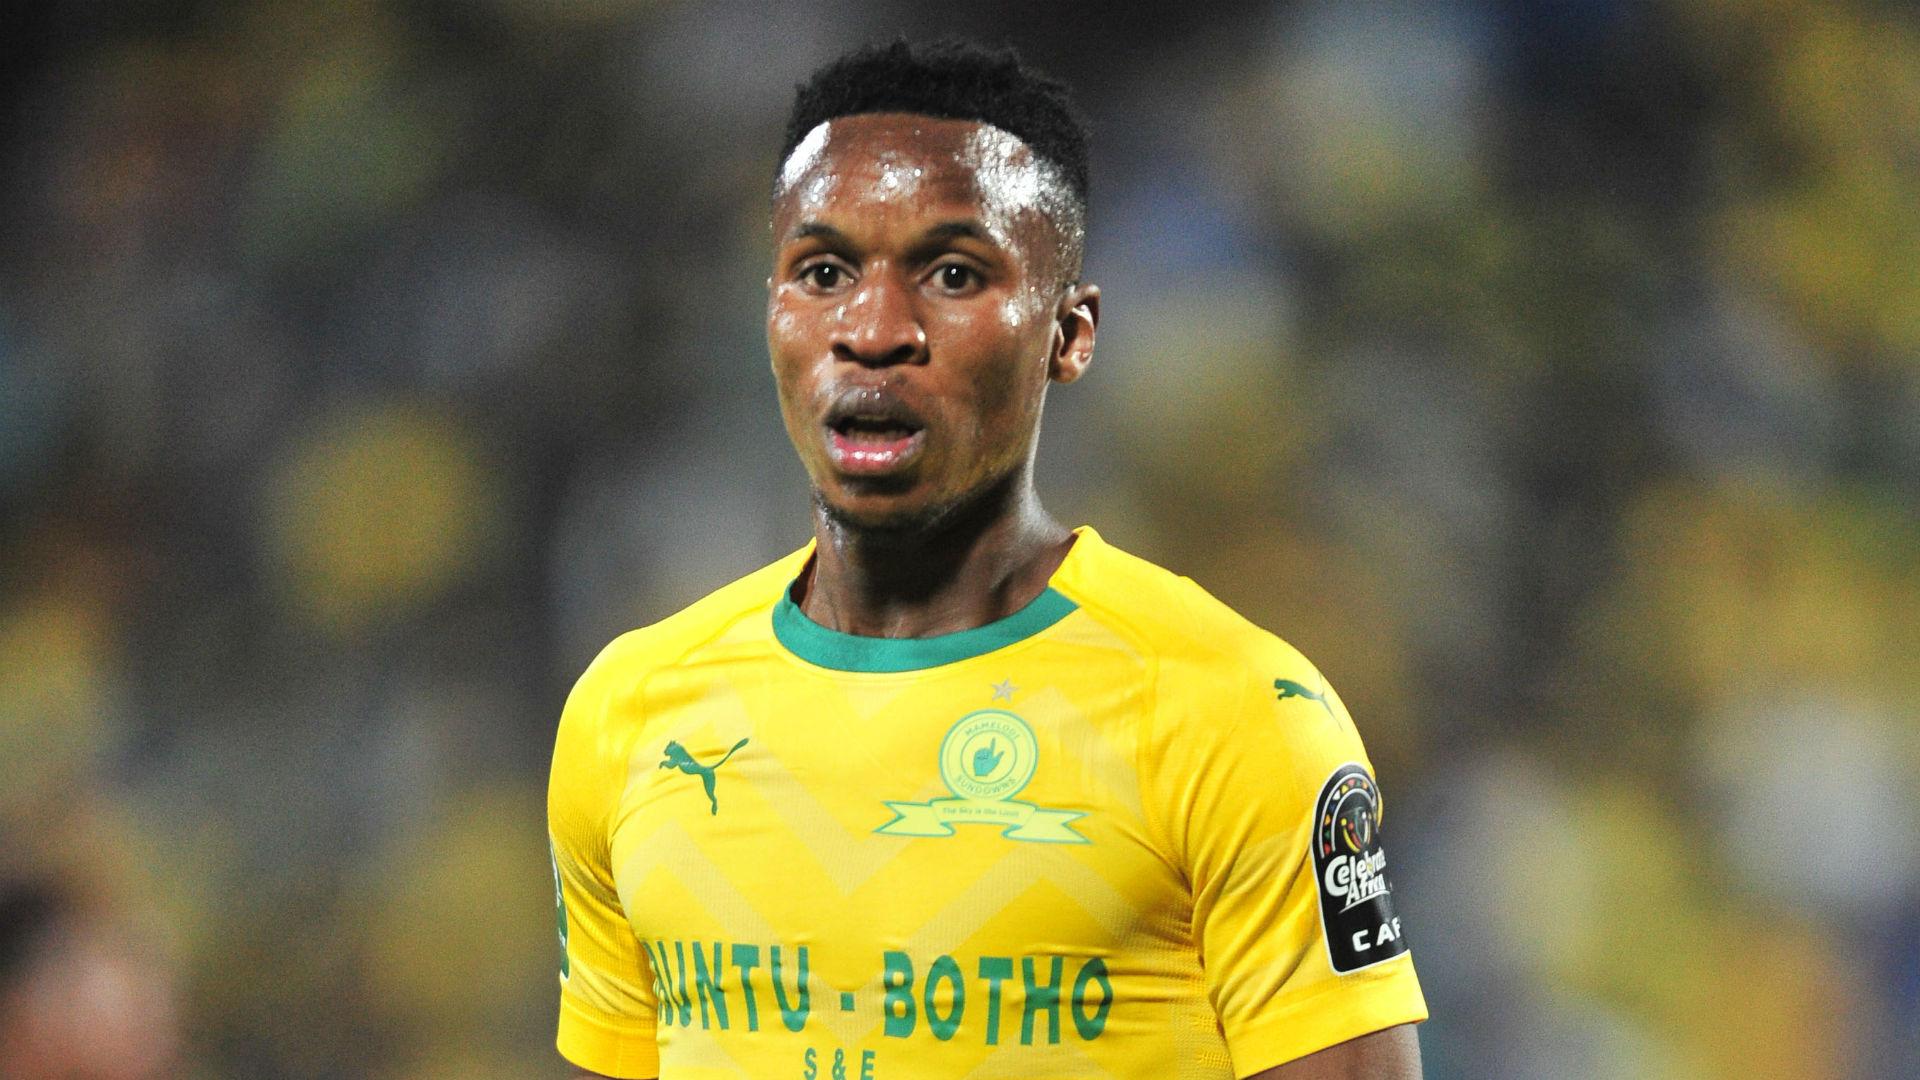 Themba Zwane Mamelodi Sundowns